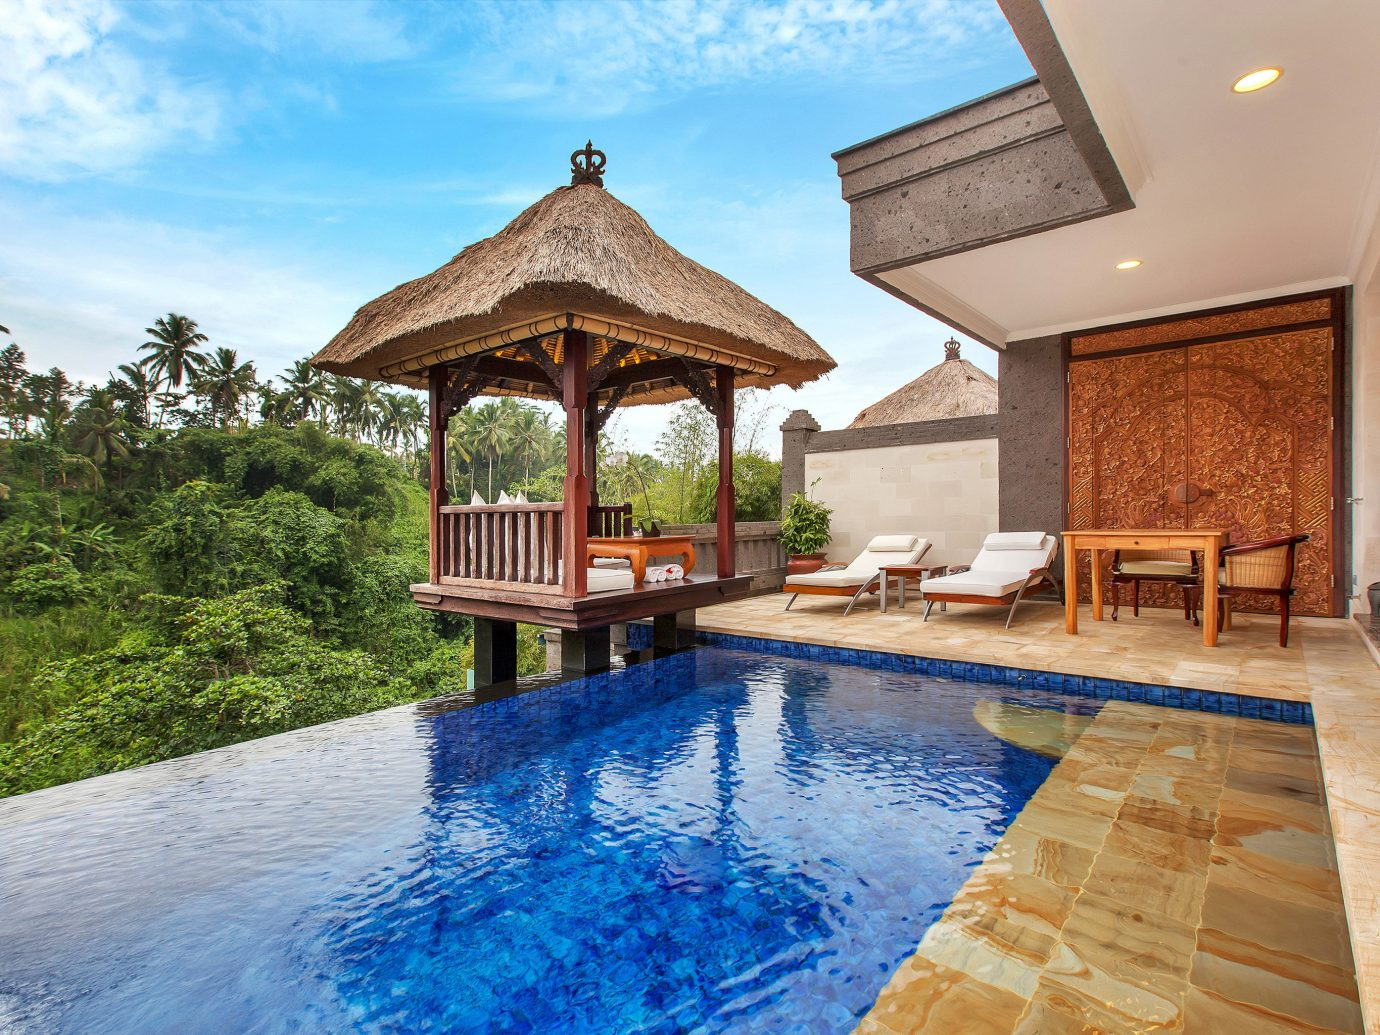 Elegant Hotels Luxury Pool Tropical outdoor building swimming pool property estate Resort Villa vacation real estate home backyard mansion cottage hacienda stone Island